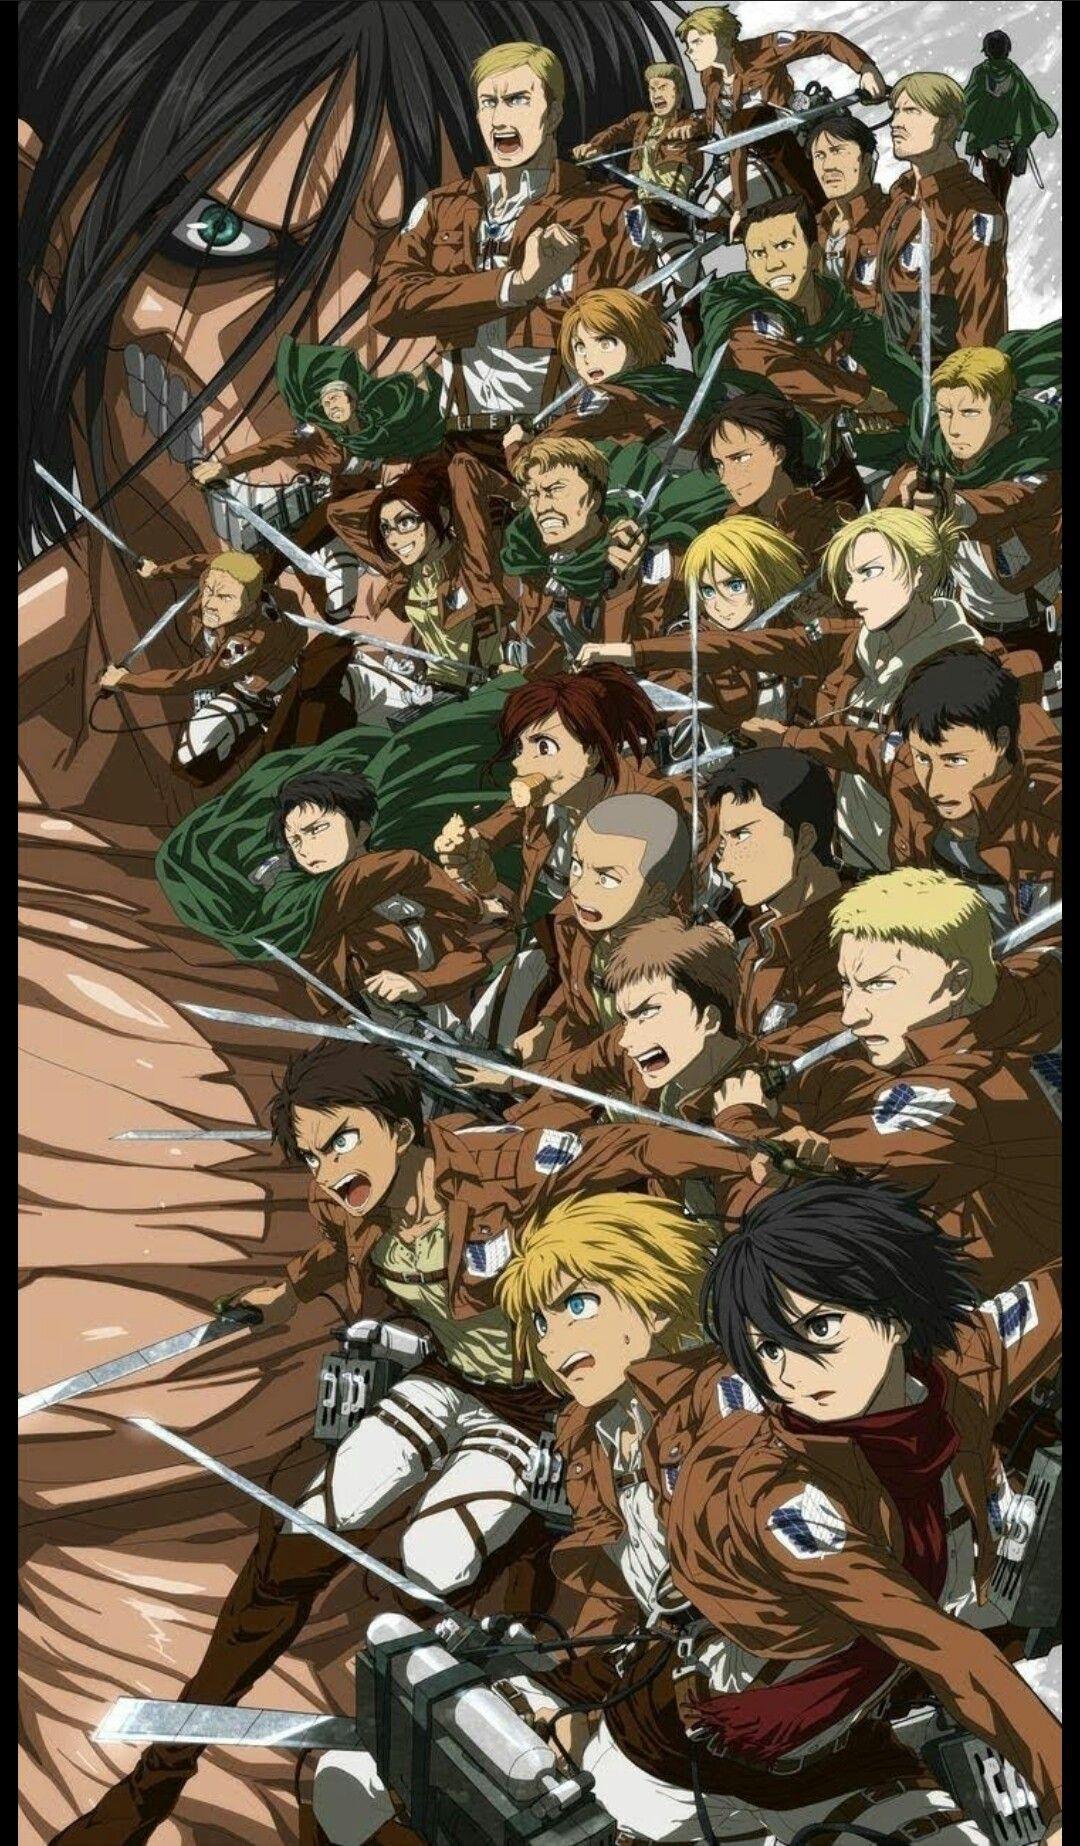 Attack On Titan Scouts Regiment Attack On Titan Anime Attack On Titan Fanart Attack On Titan